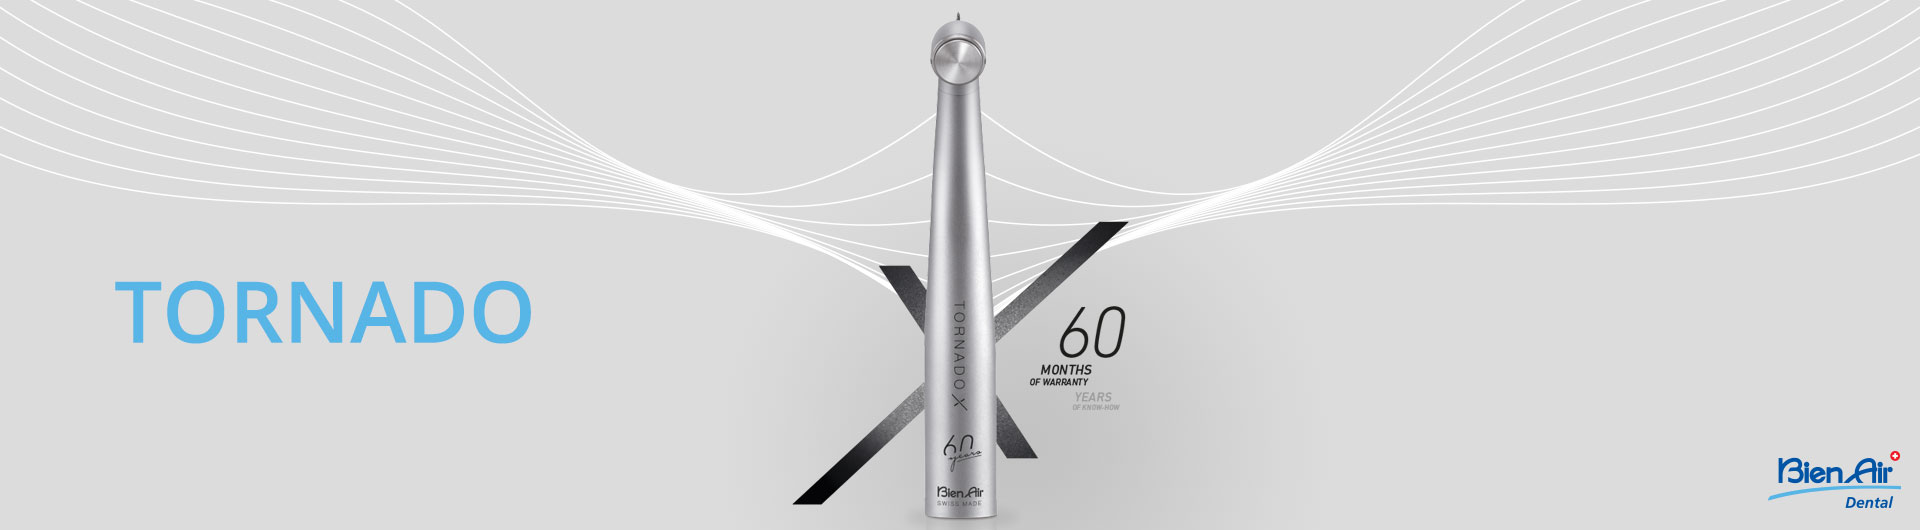 TORNADO X új turbina a Bien Air Dental-tól